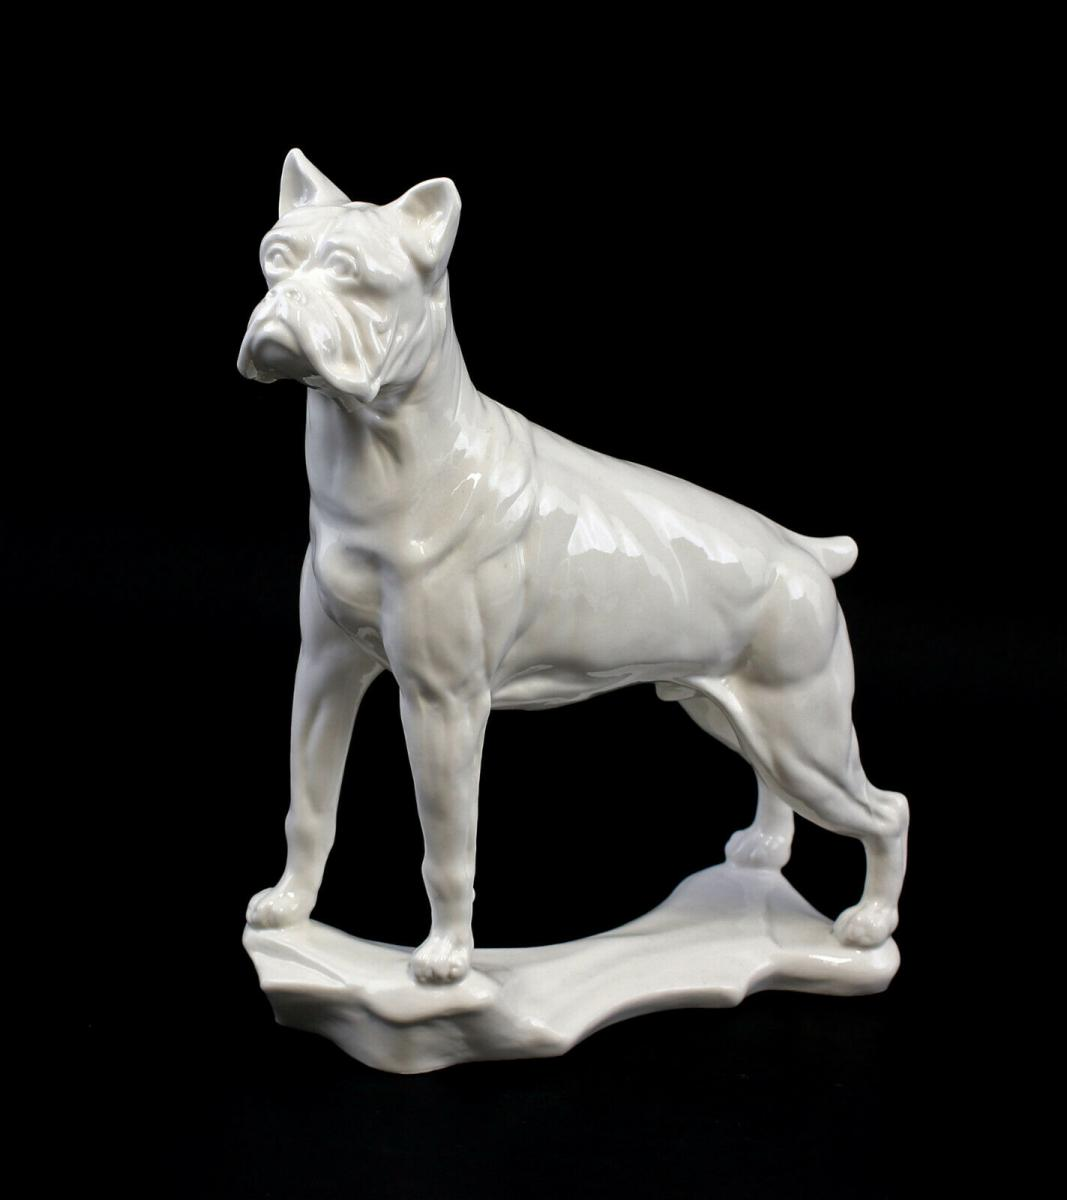 9959463 Porzellan Figur Boxer Hund weiß Ens 20x7x22,5cm